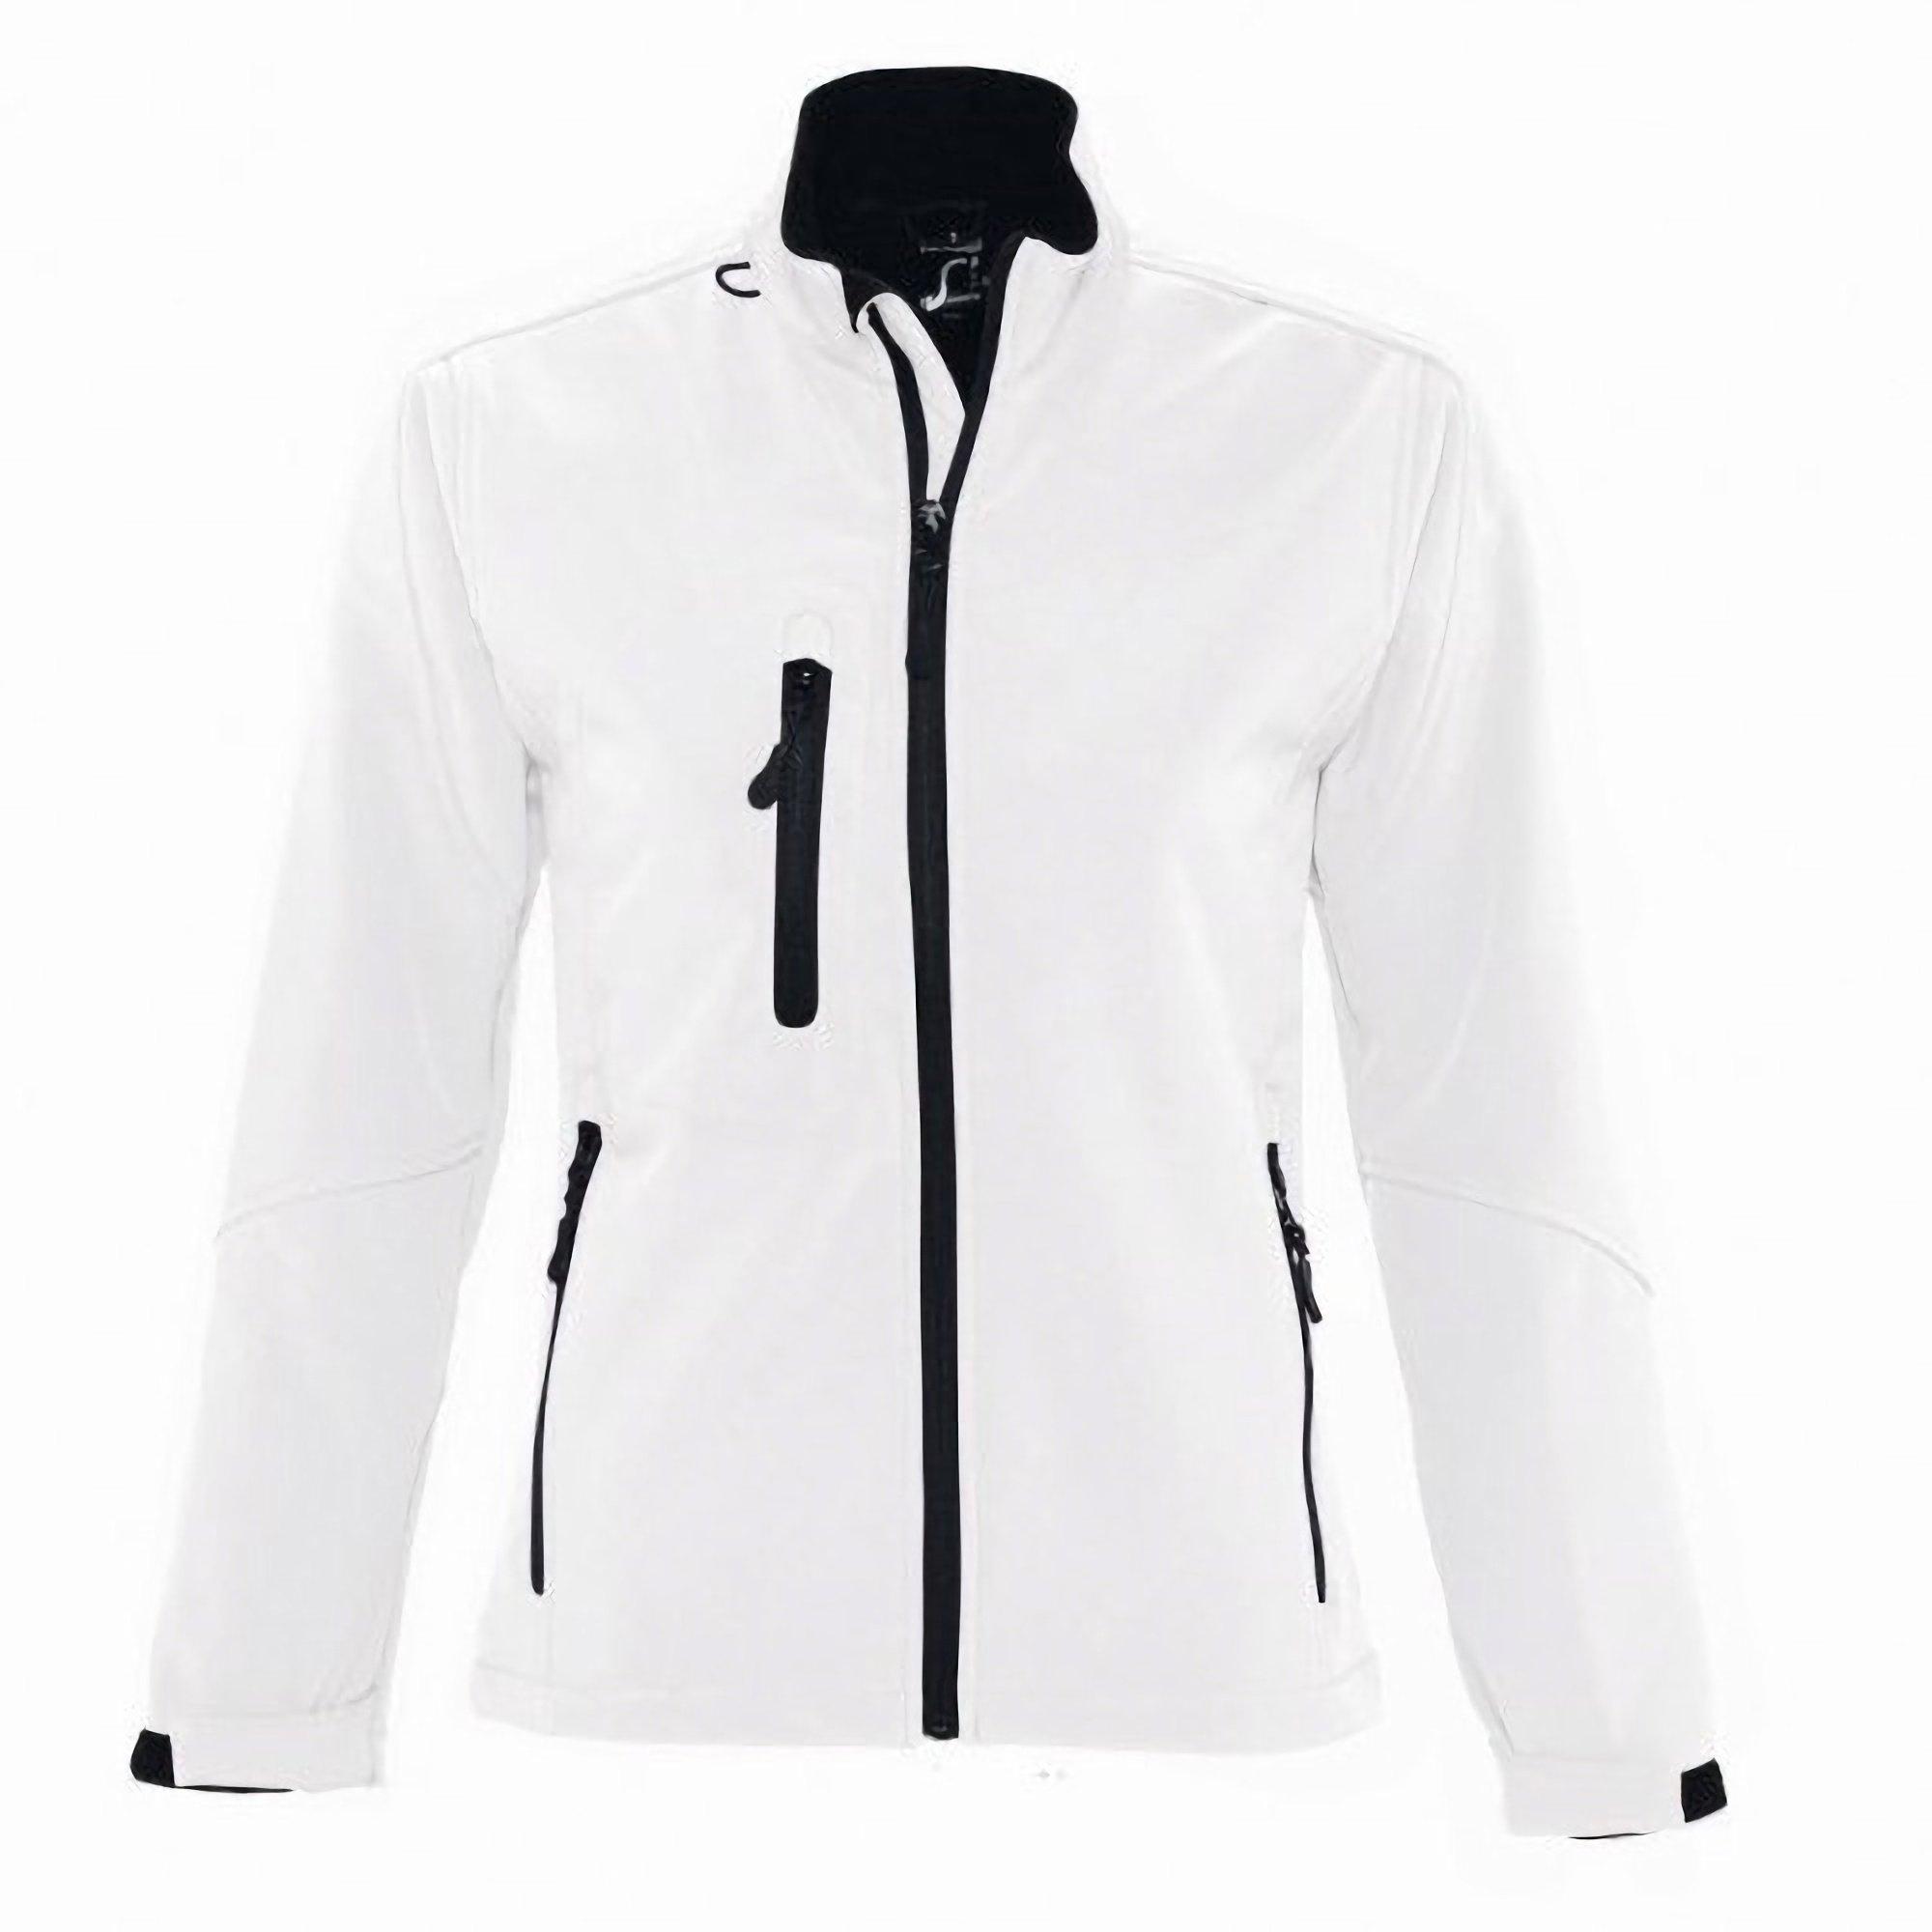 SOLS softshell-jack »Damen Roxy Softshell-Jacke, atmungsaktiv, winddicht, wasserabweisend« goedkoop op otto.nl kopen